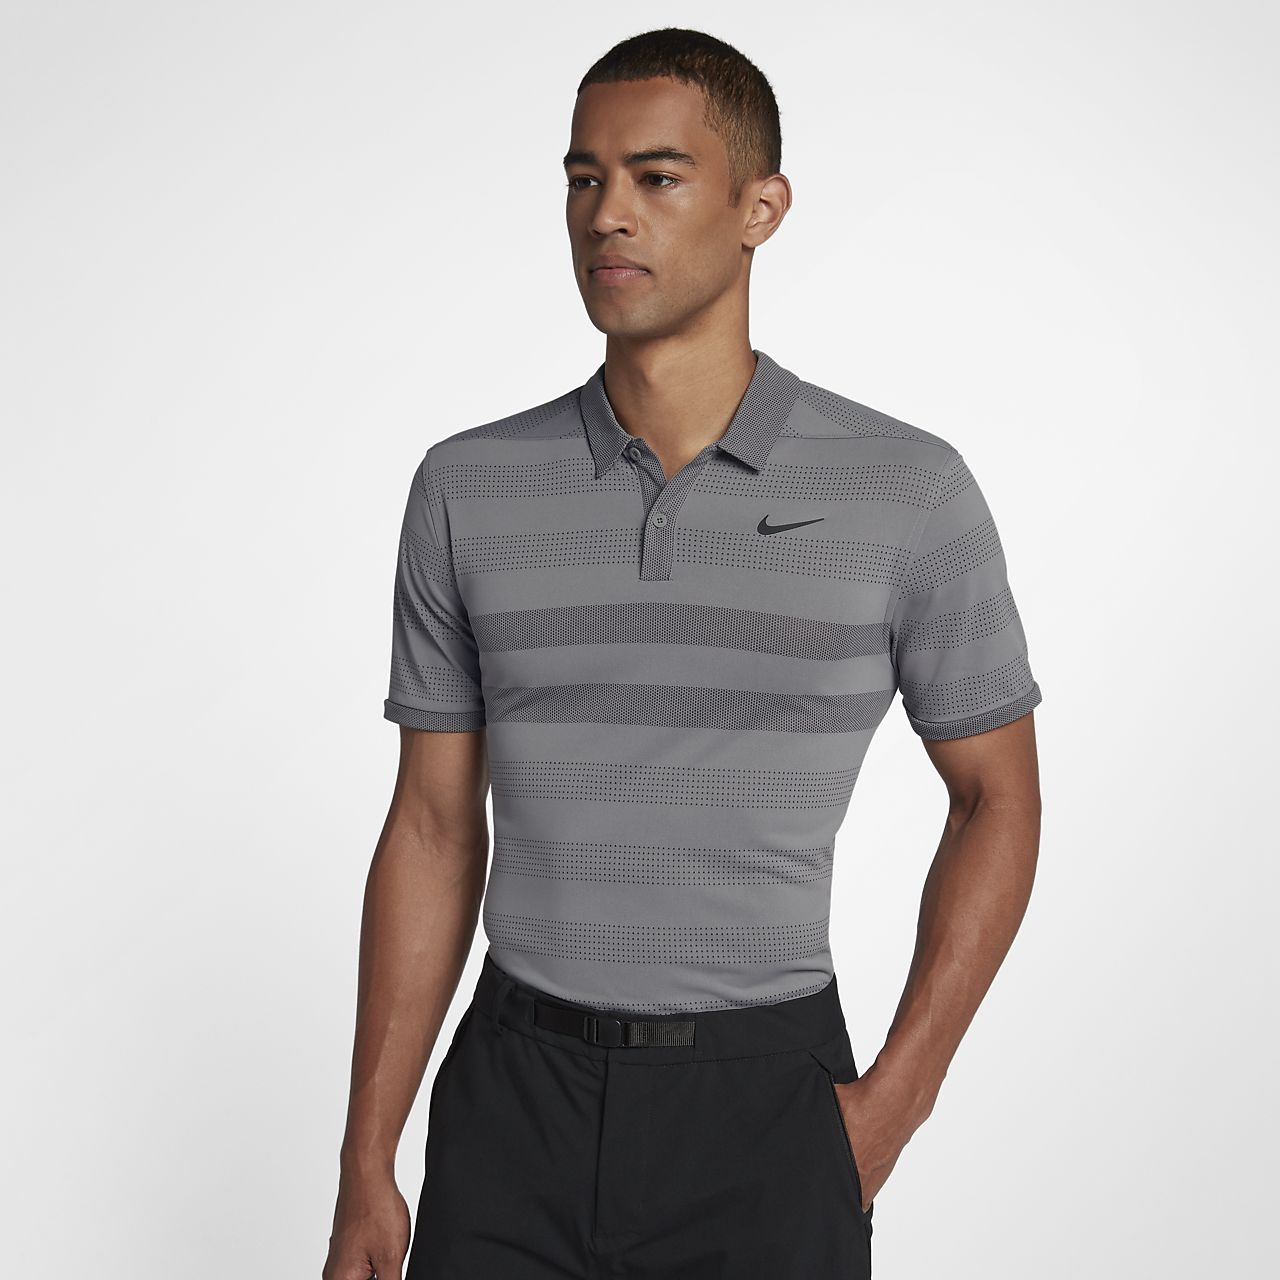 8cb64a62 Nike Zonal Cooling Men's Striped Golf Polo. Nike.com NL